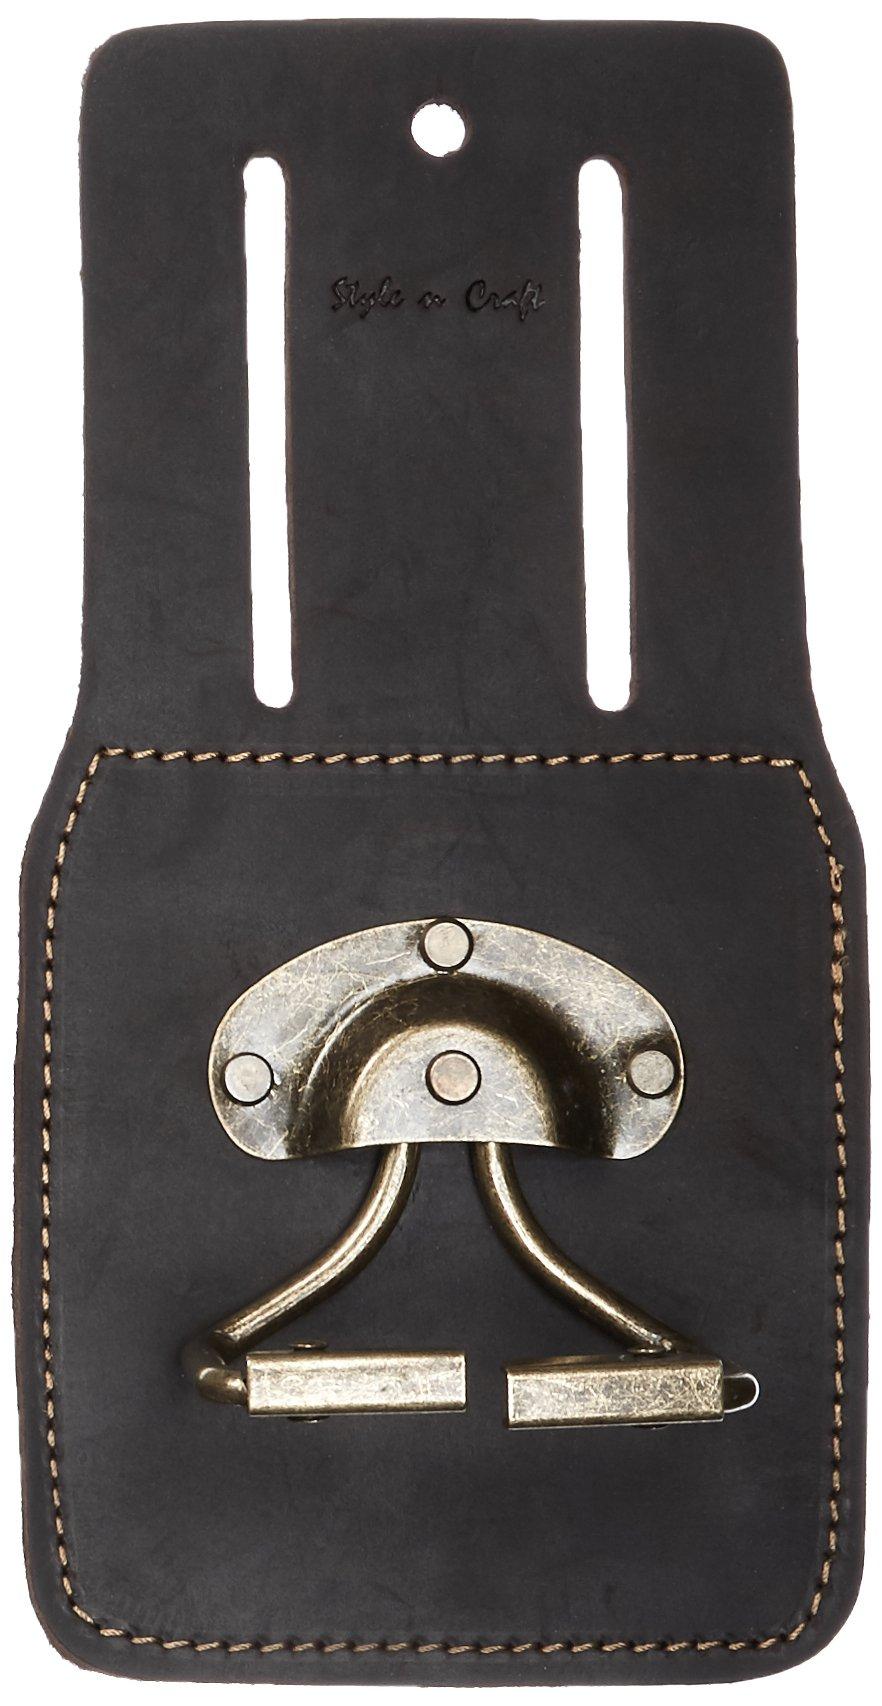 Style n Craft 74440 Spring Loaded Swivel Hammer/Hatchet Holder in Heavy Top Grain Oiled Leather, Dark Brown